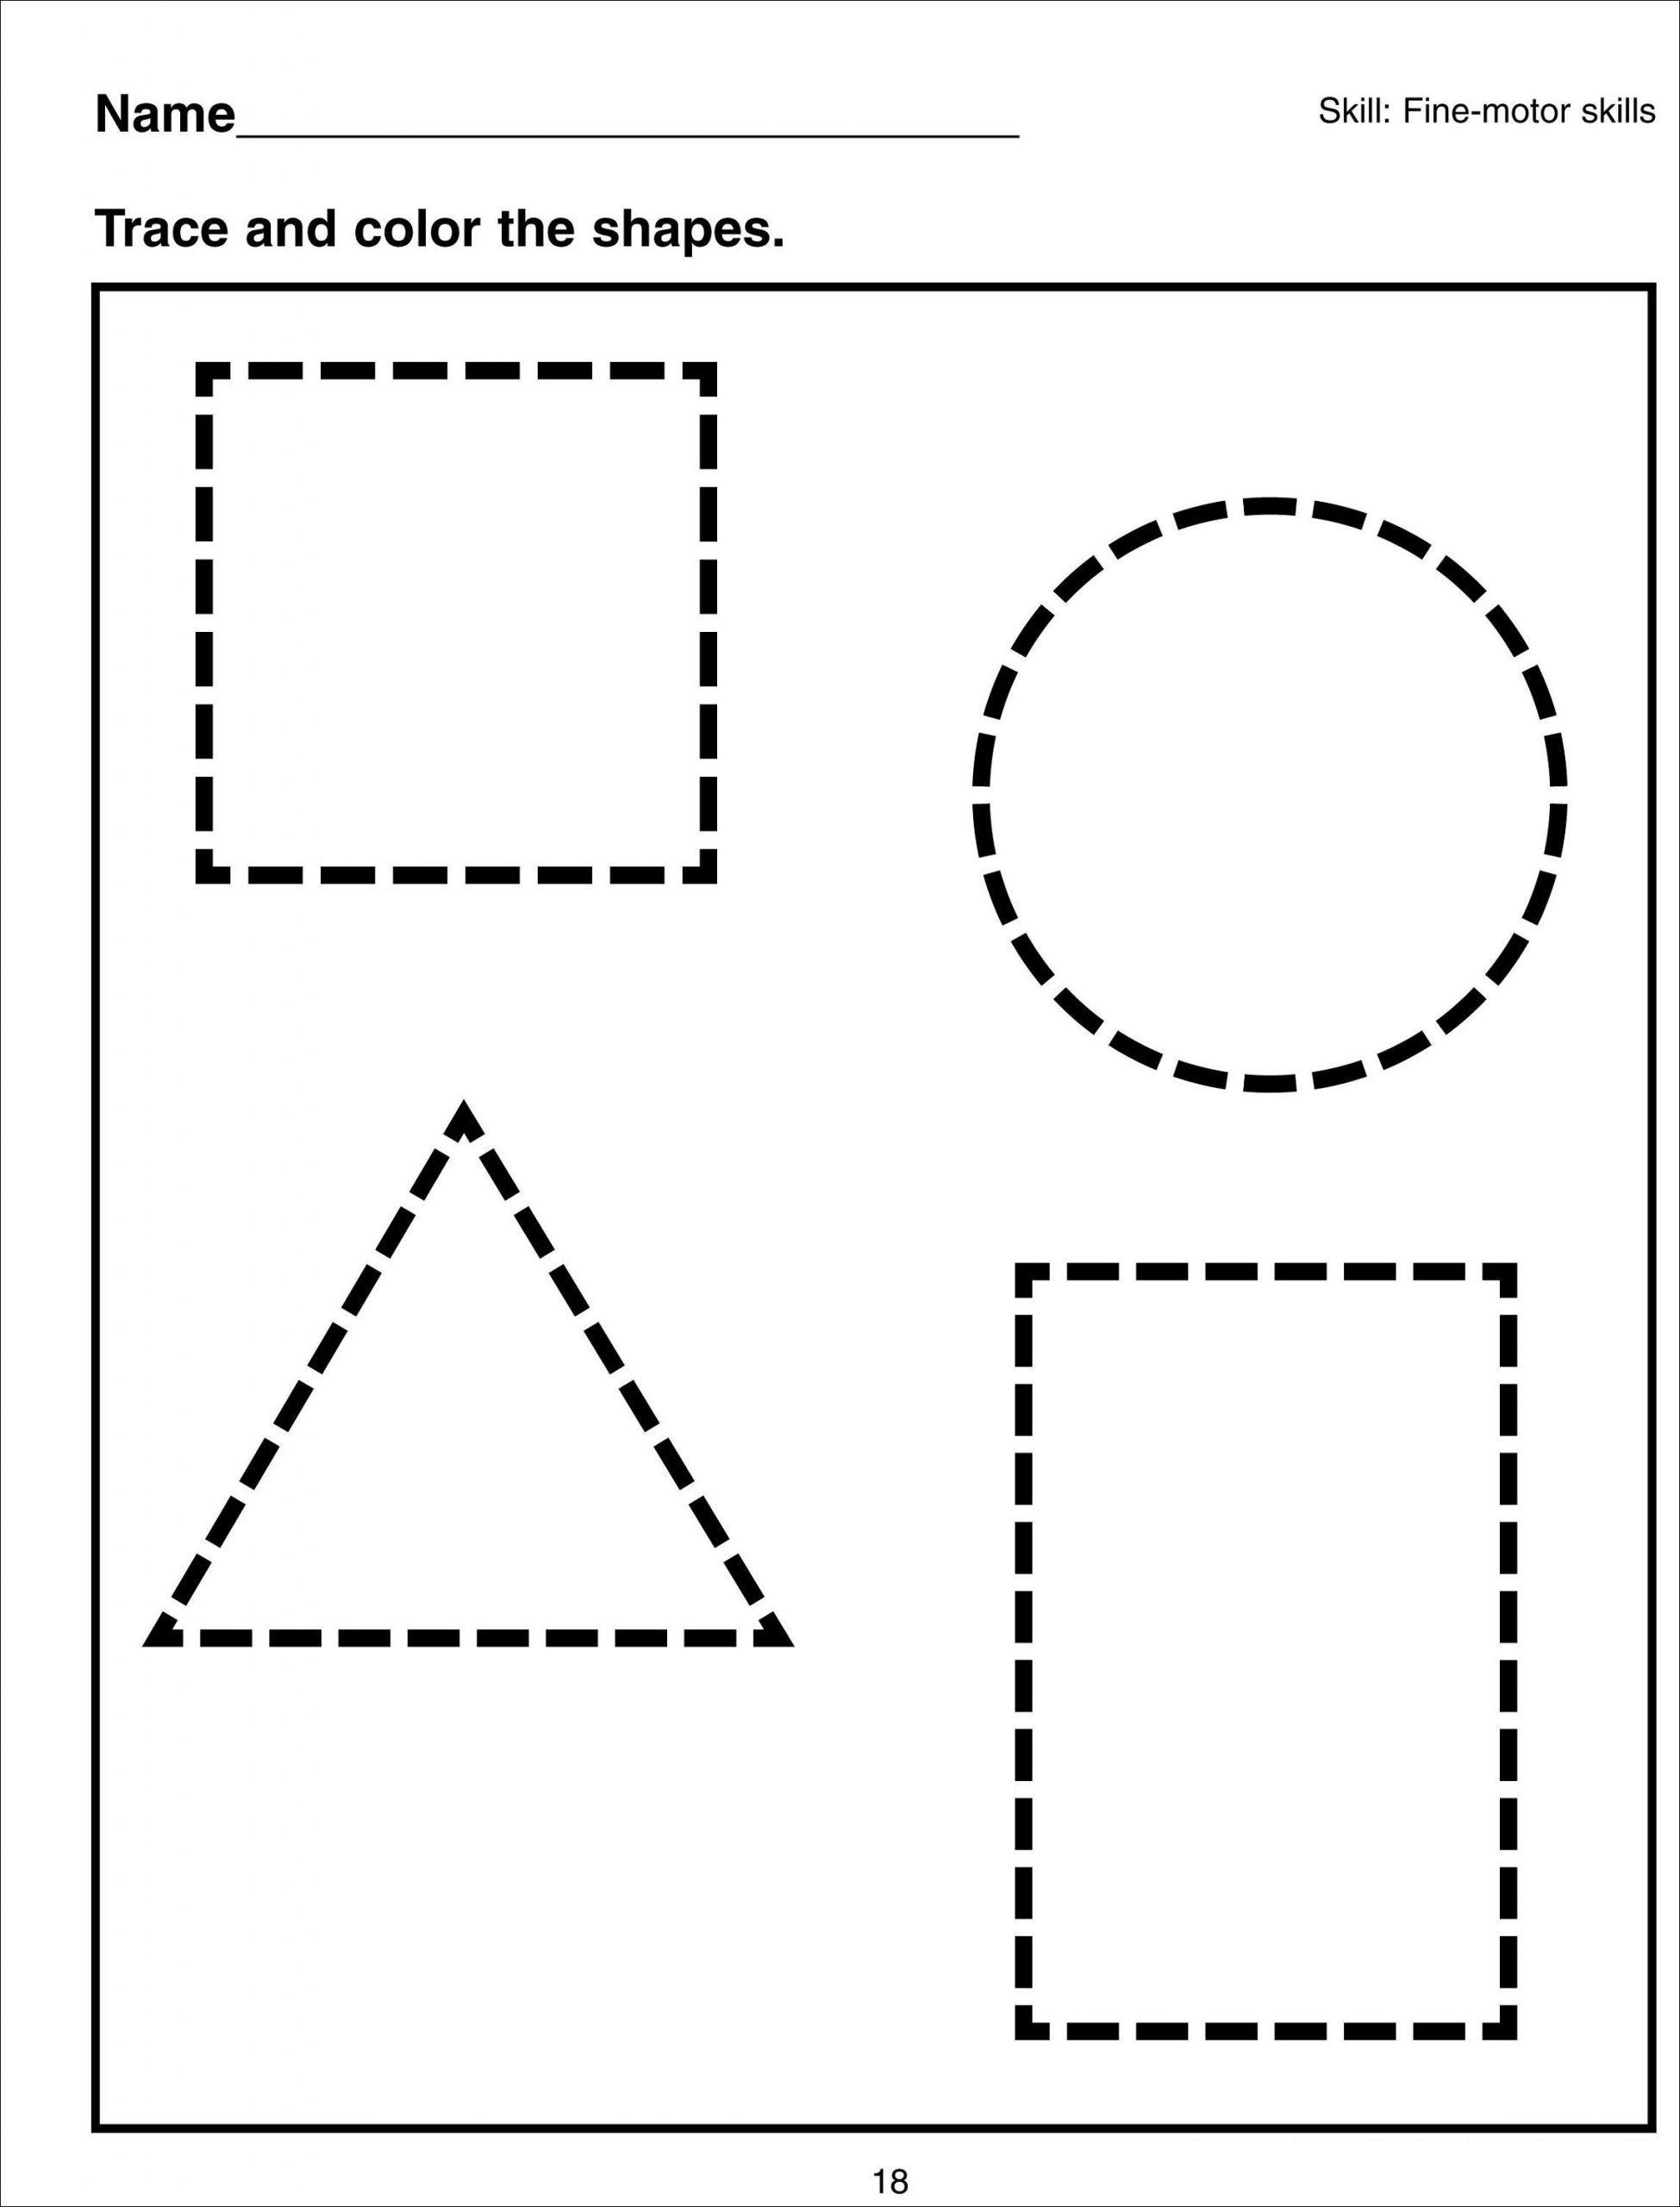 4 Worksheet Free Preschool Kindergarten Worksheets Sorting Sort Objects U Shapes Worksheet Kindergarten Shape Tracing Worksheets Shape Worksheets For Preschool [ 2560 x 1949 Pixel ]